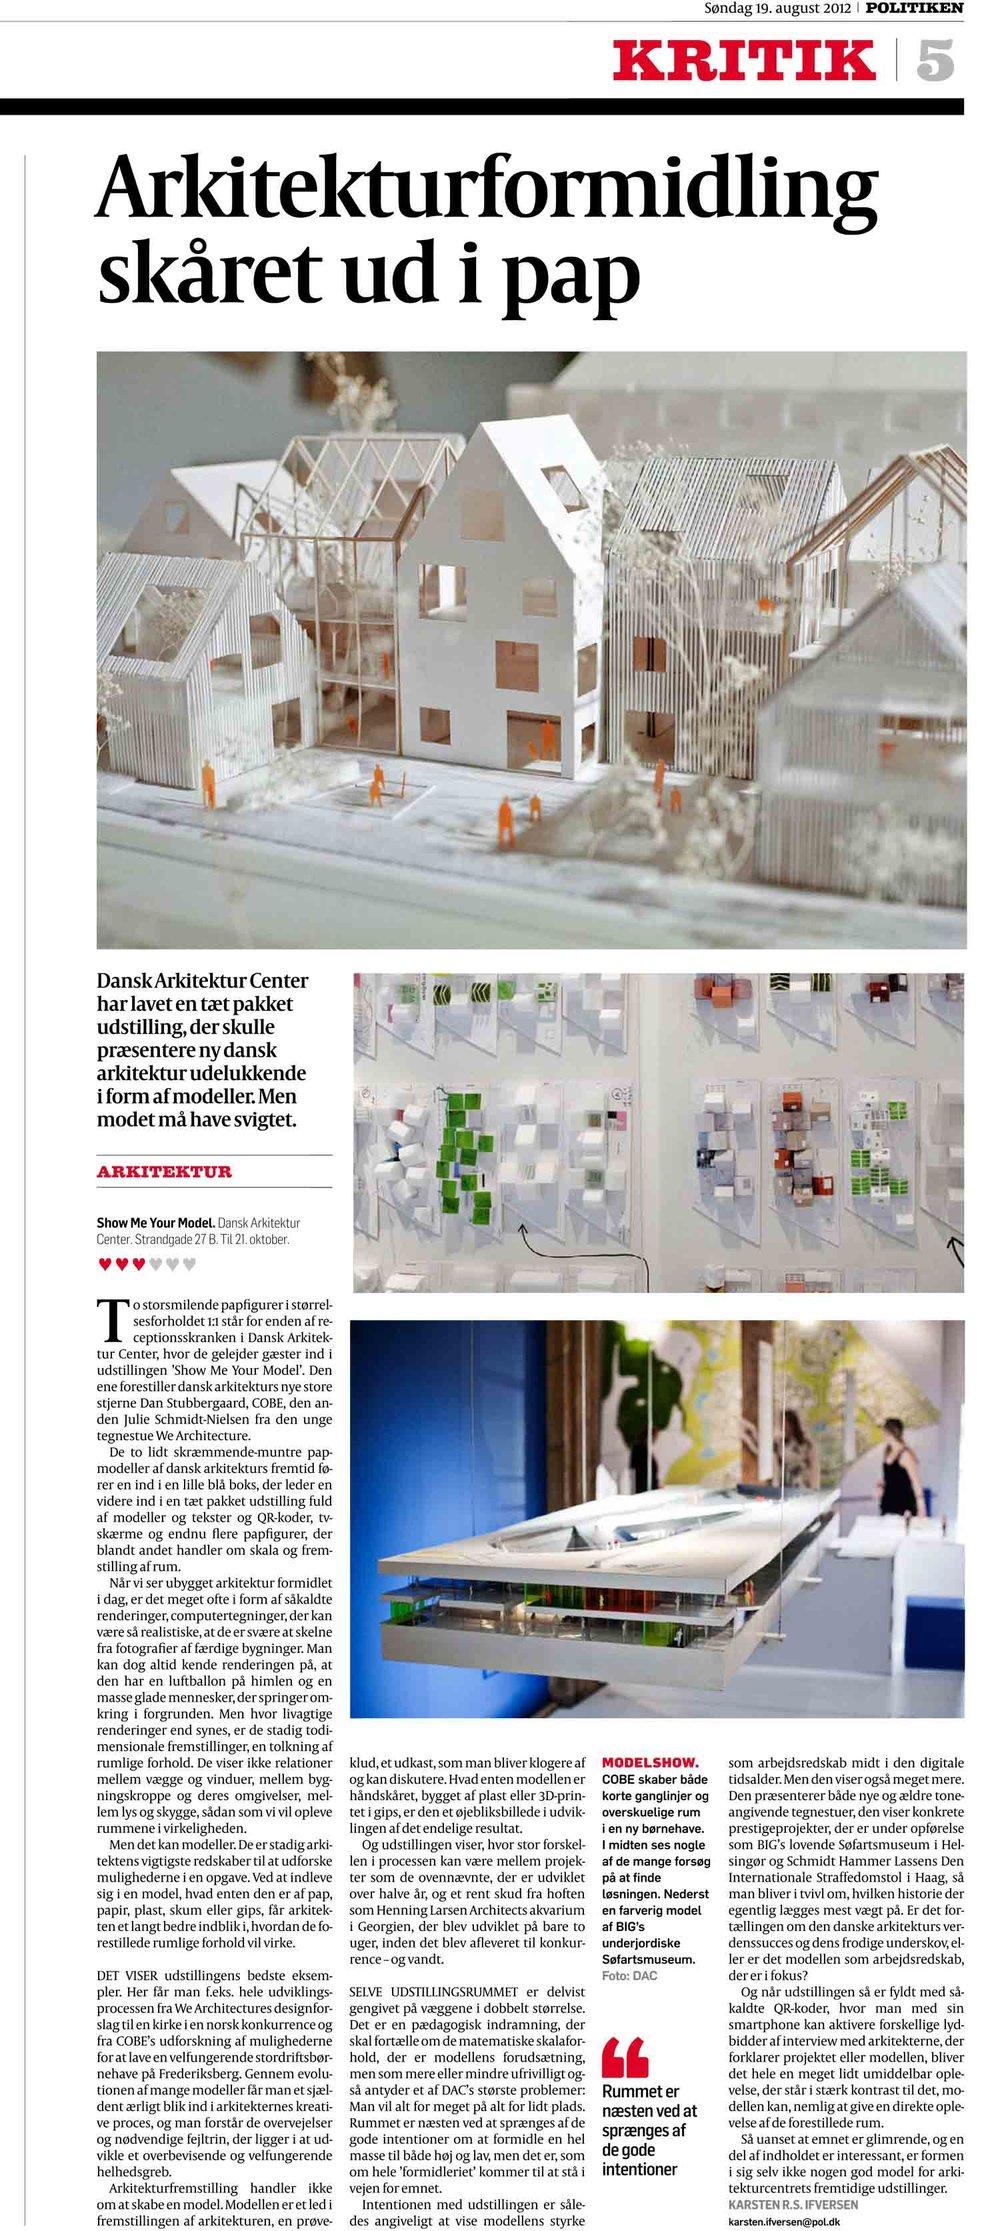 Politiken_Dinamarca_19agosto12-2-2.jpg